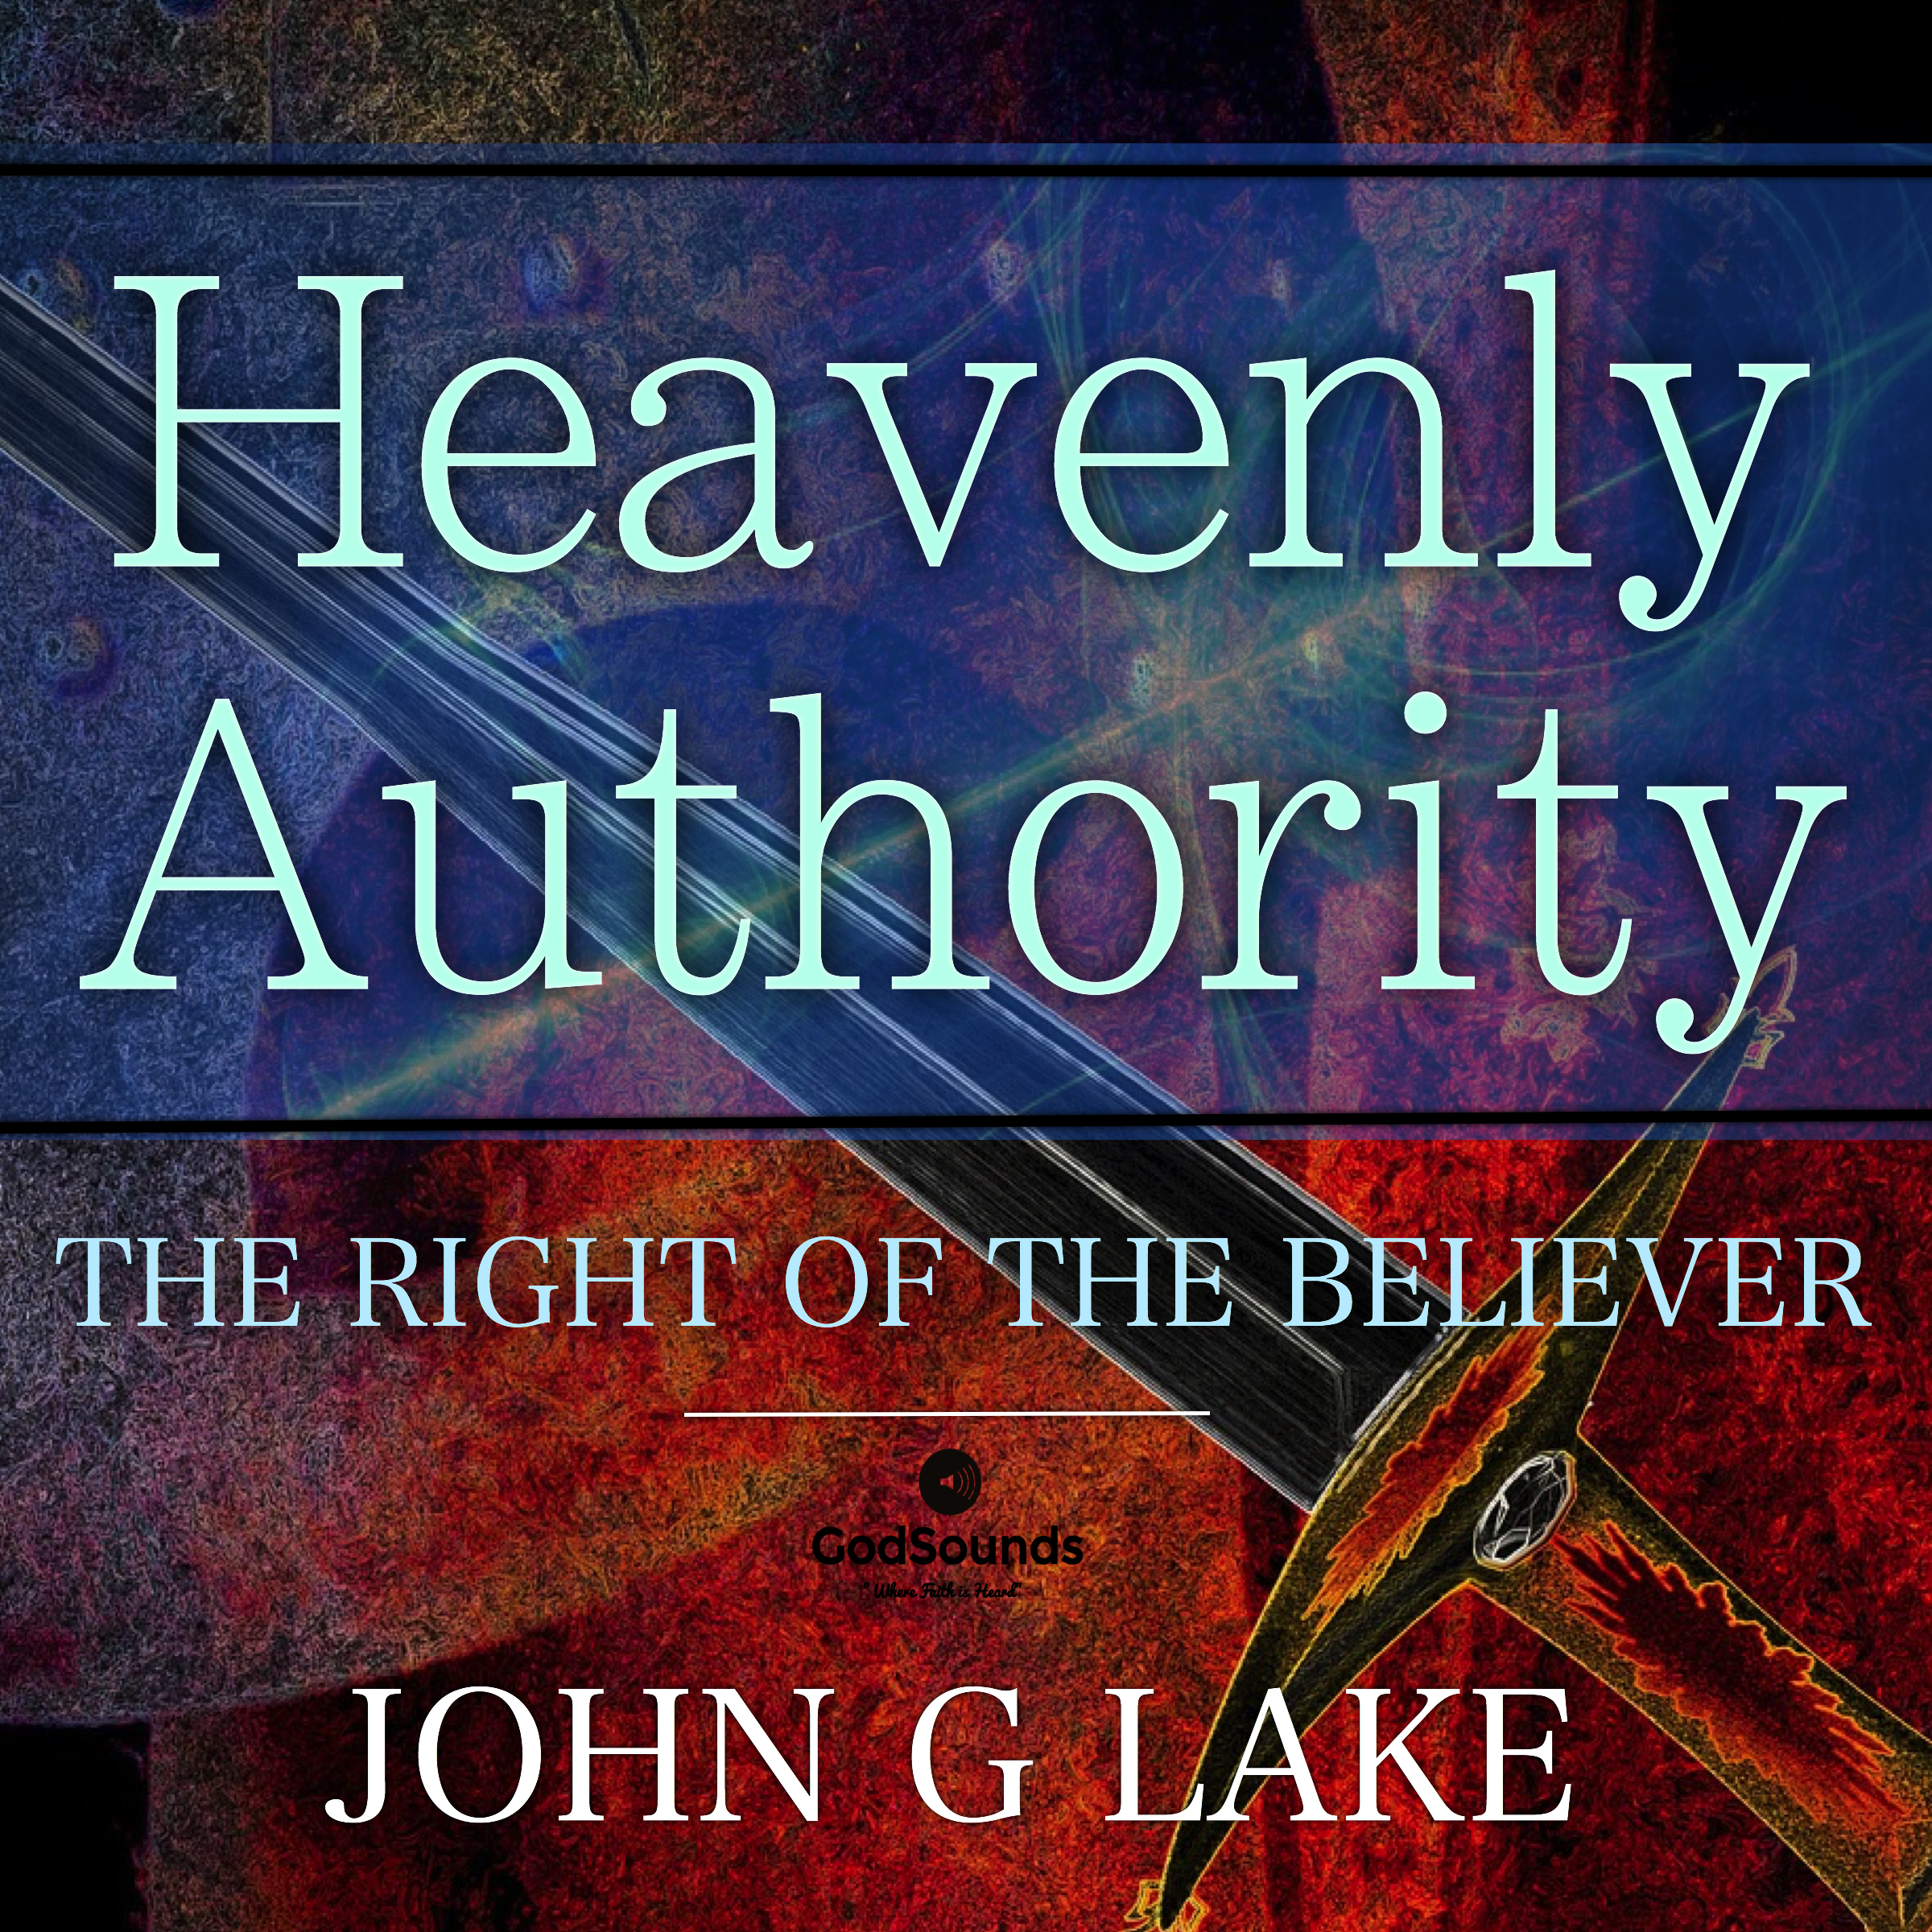 Audiobook Cover (Heavenly Authority).jpg